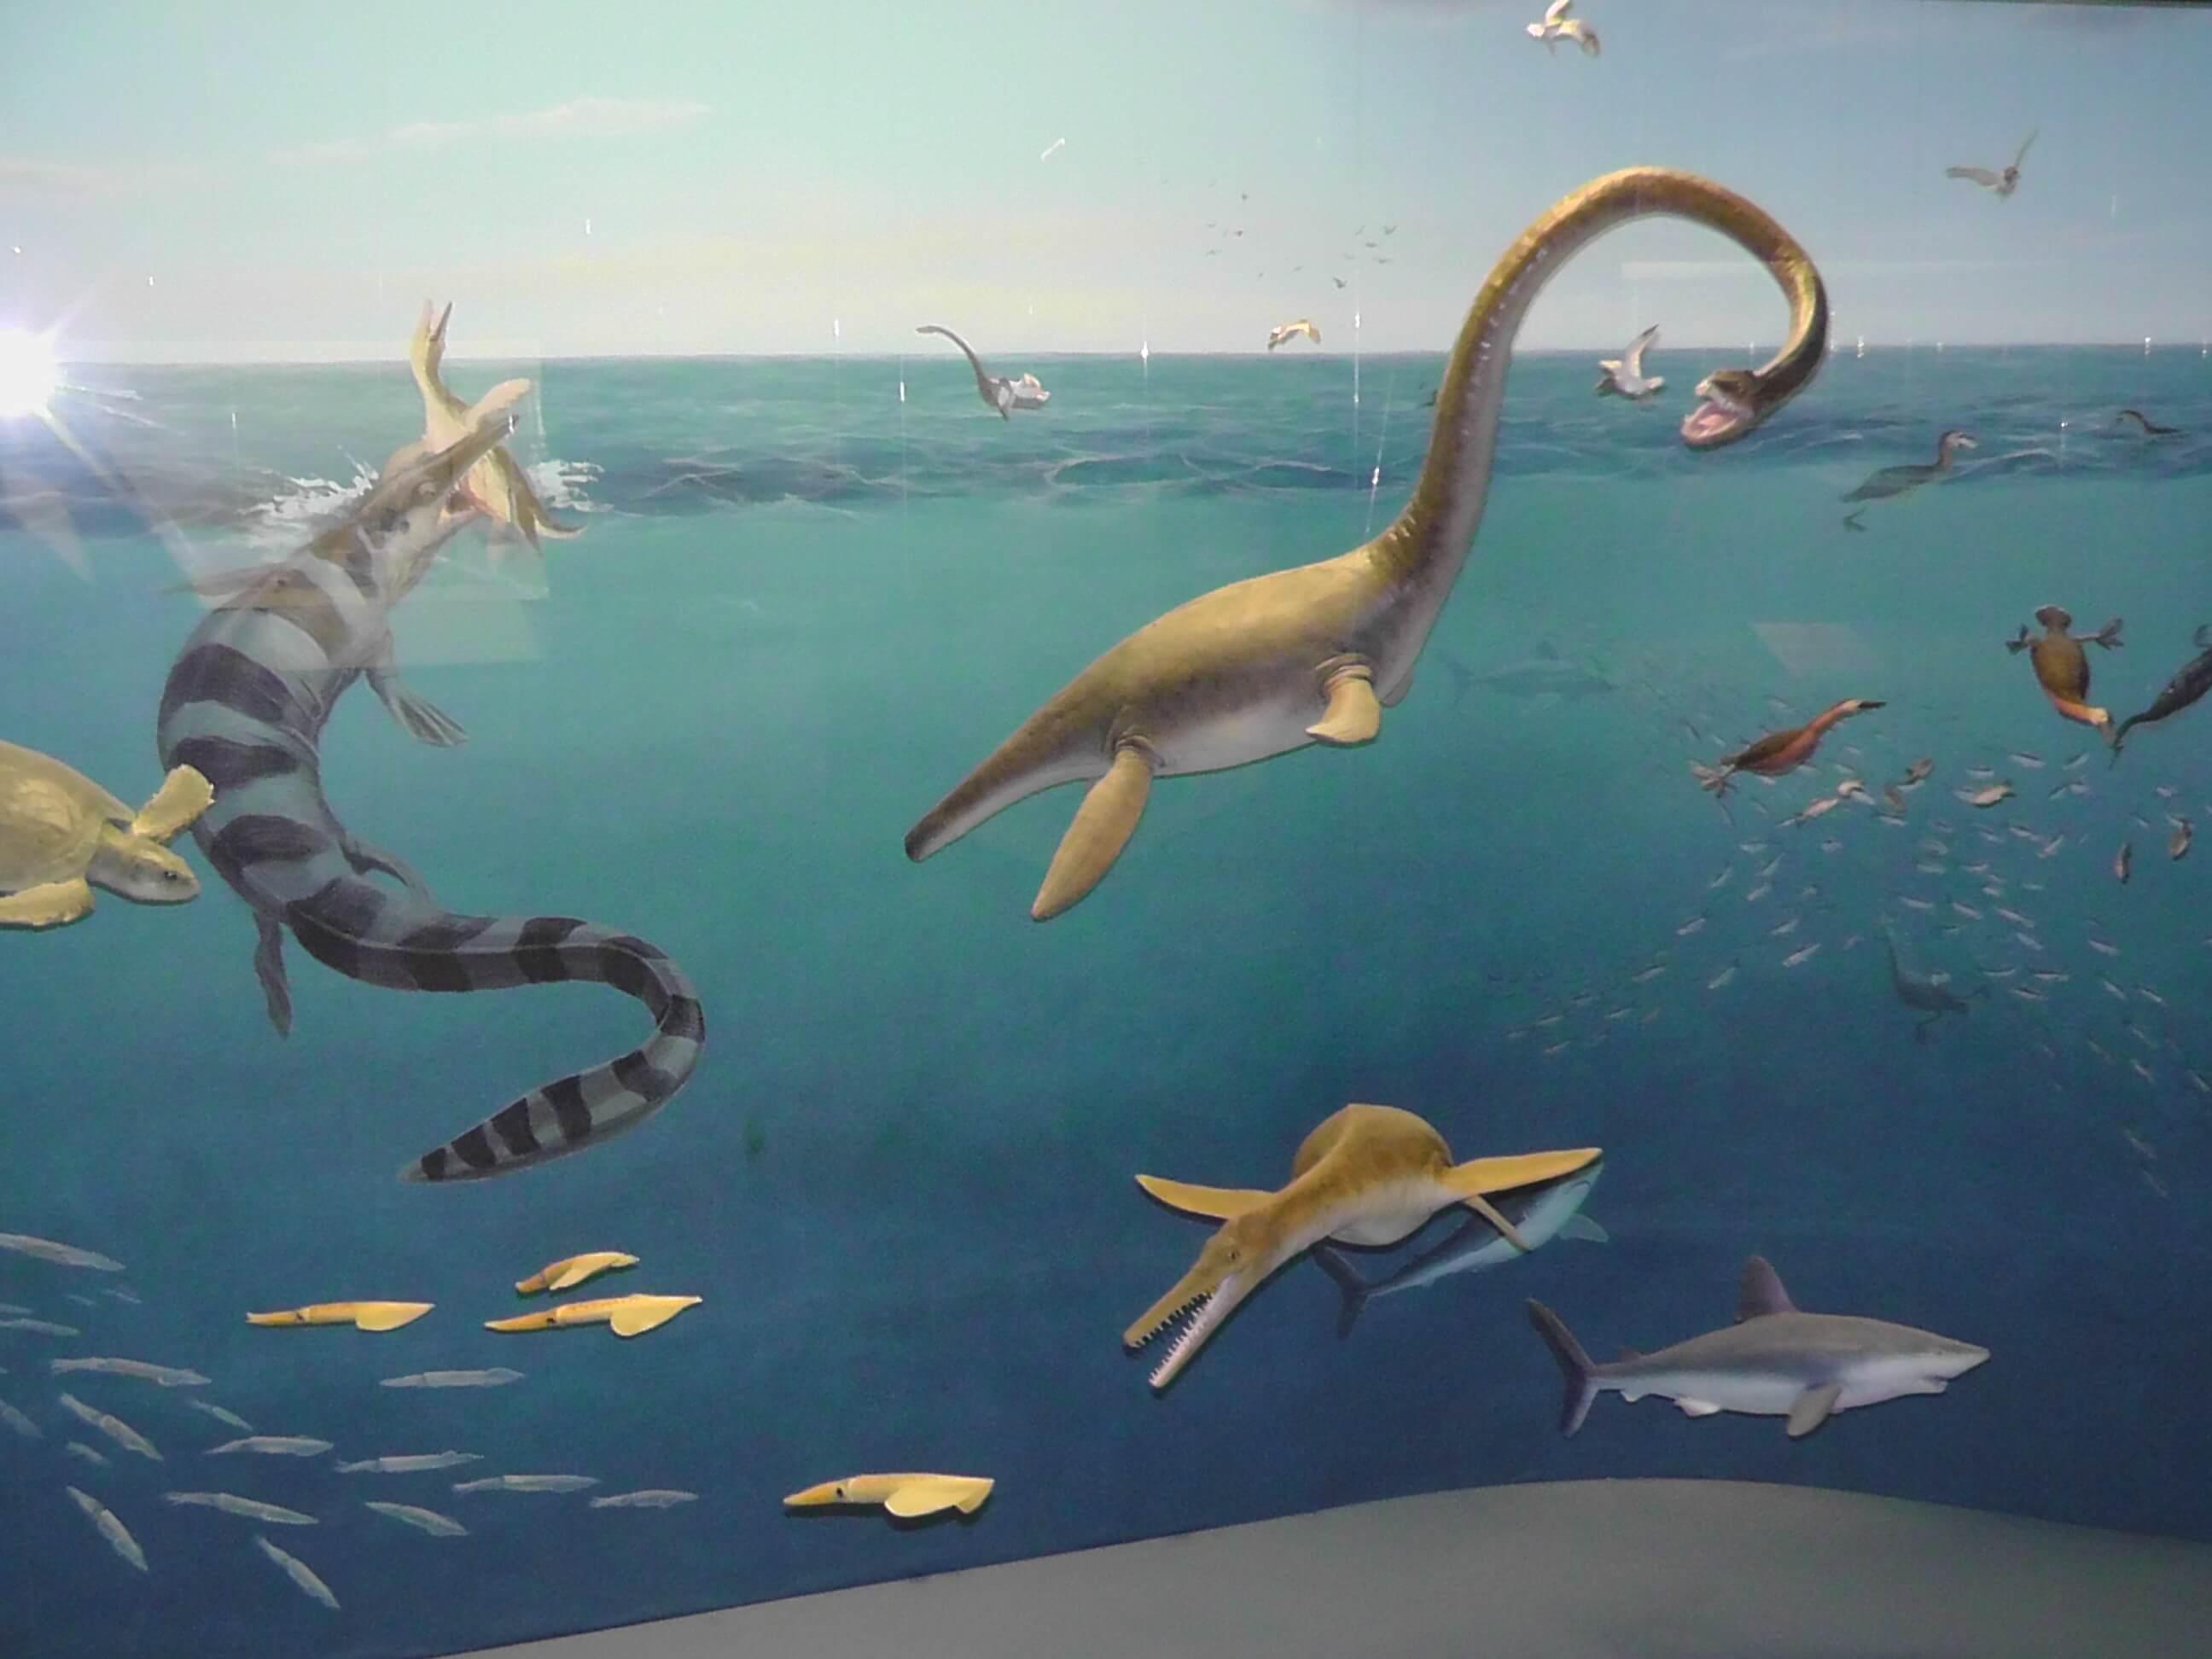 Cretaceous sea scene, Canadian Fossil Discovery Center, Morden, Manitoba